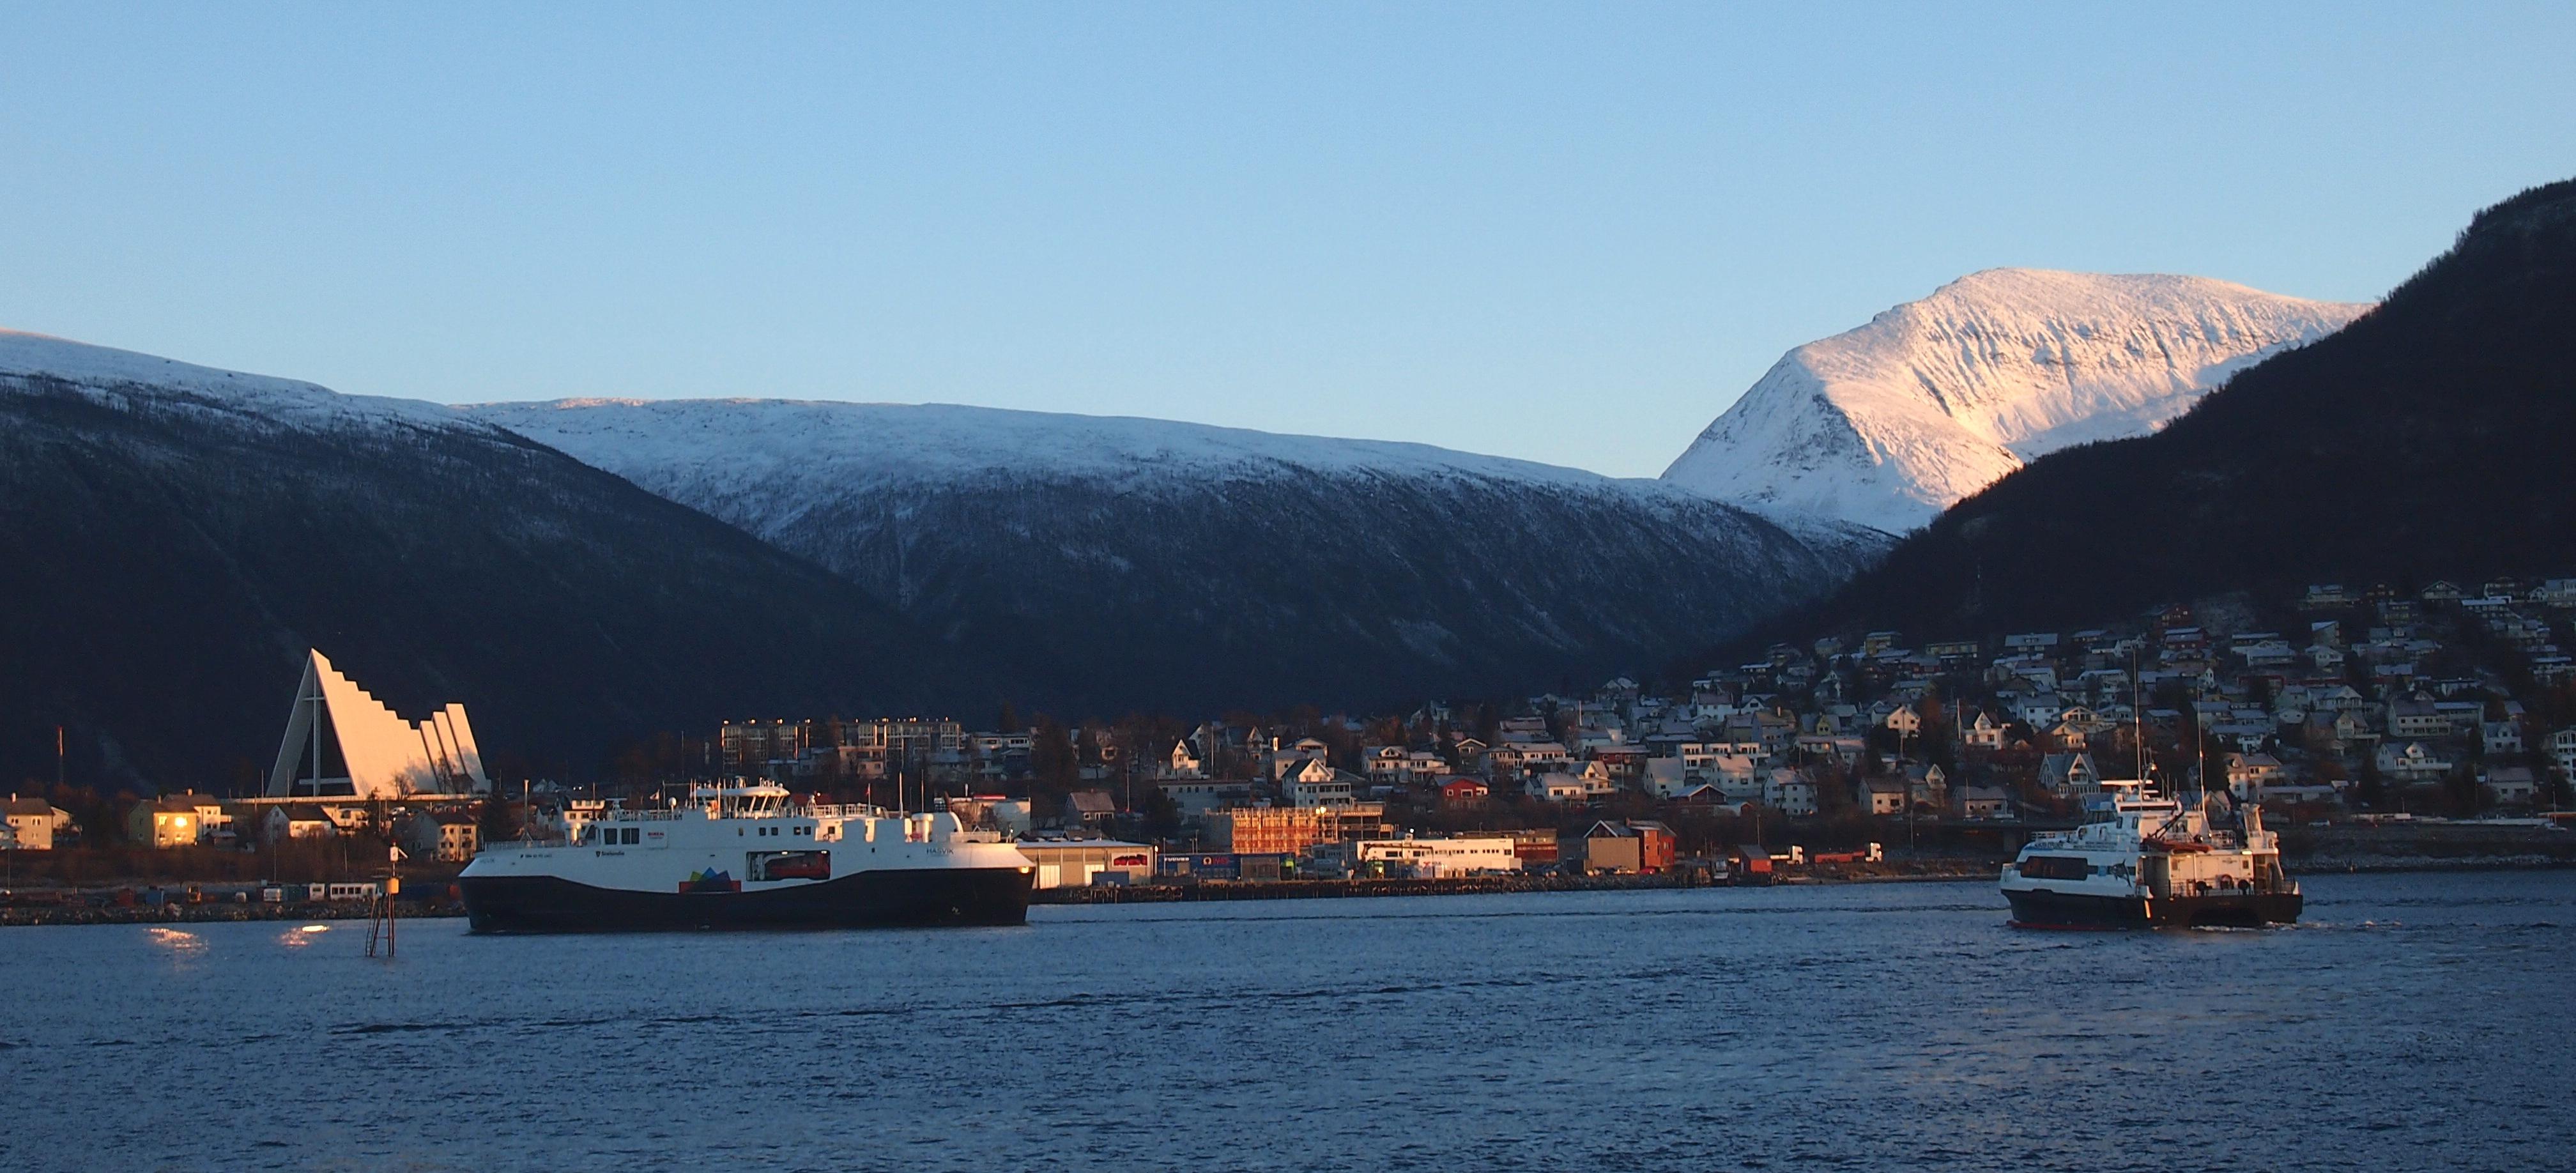 Город Тромсе на севере Норвегии. Фото: Валерий Поташов